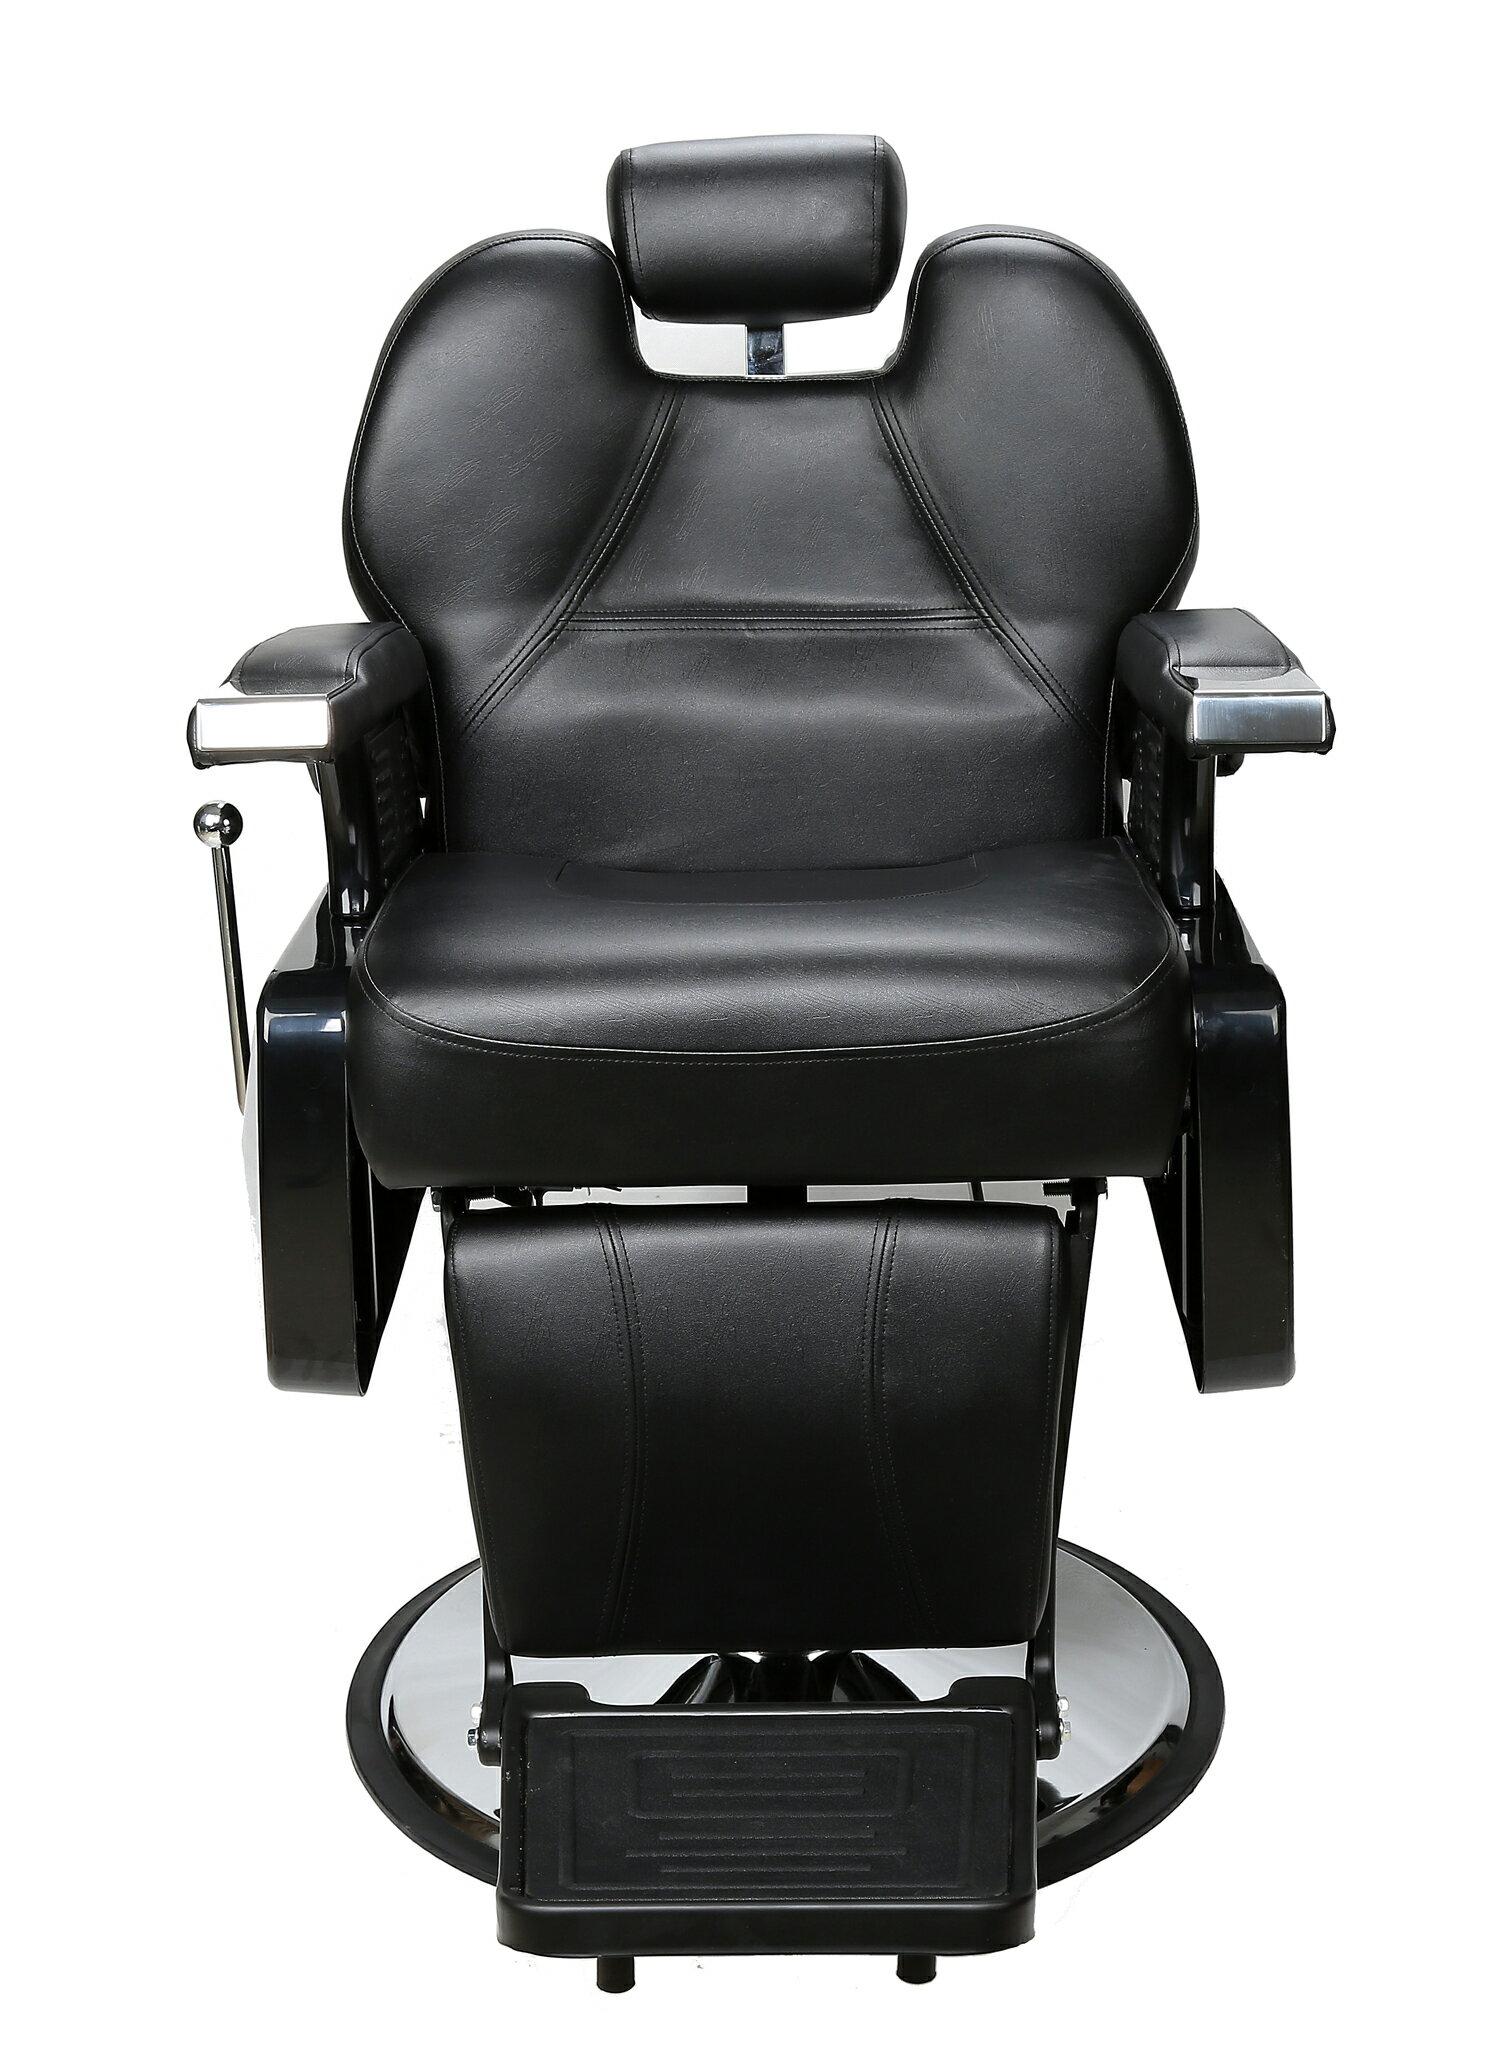 BarberPub All Purpose Hydraulic Recline Salon Beauty Spa Styling Barber Chair Black 1